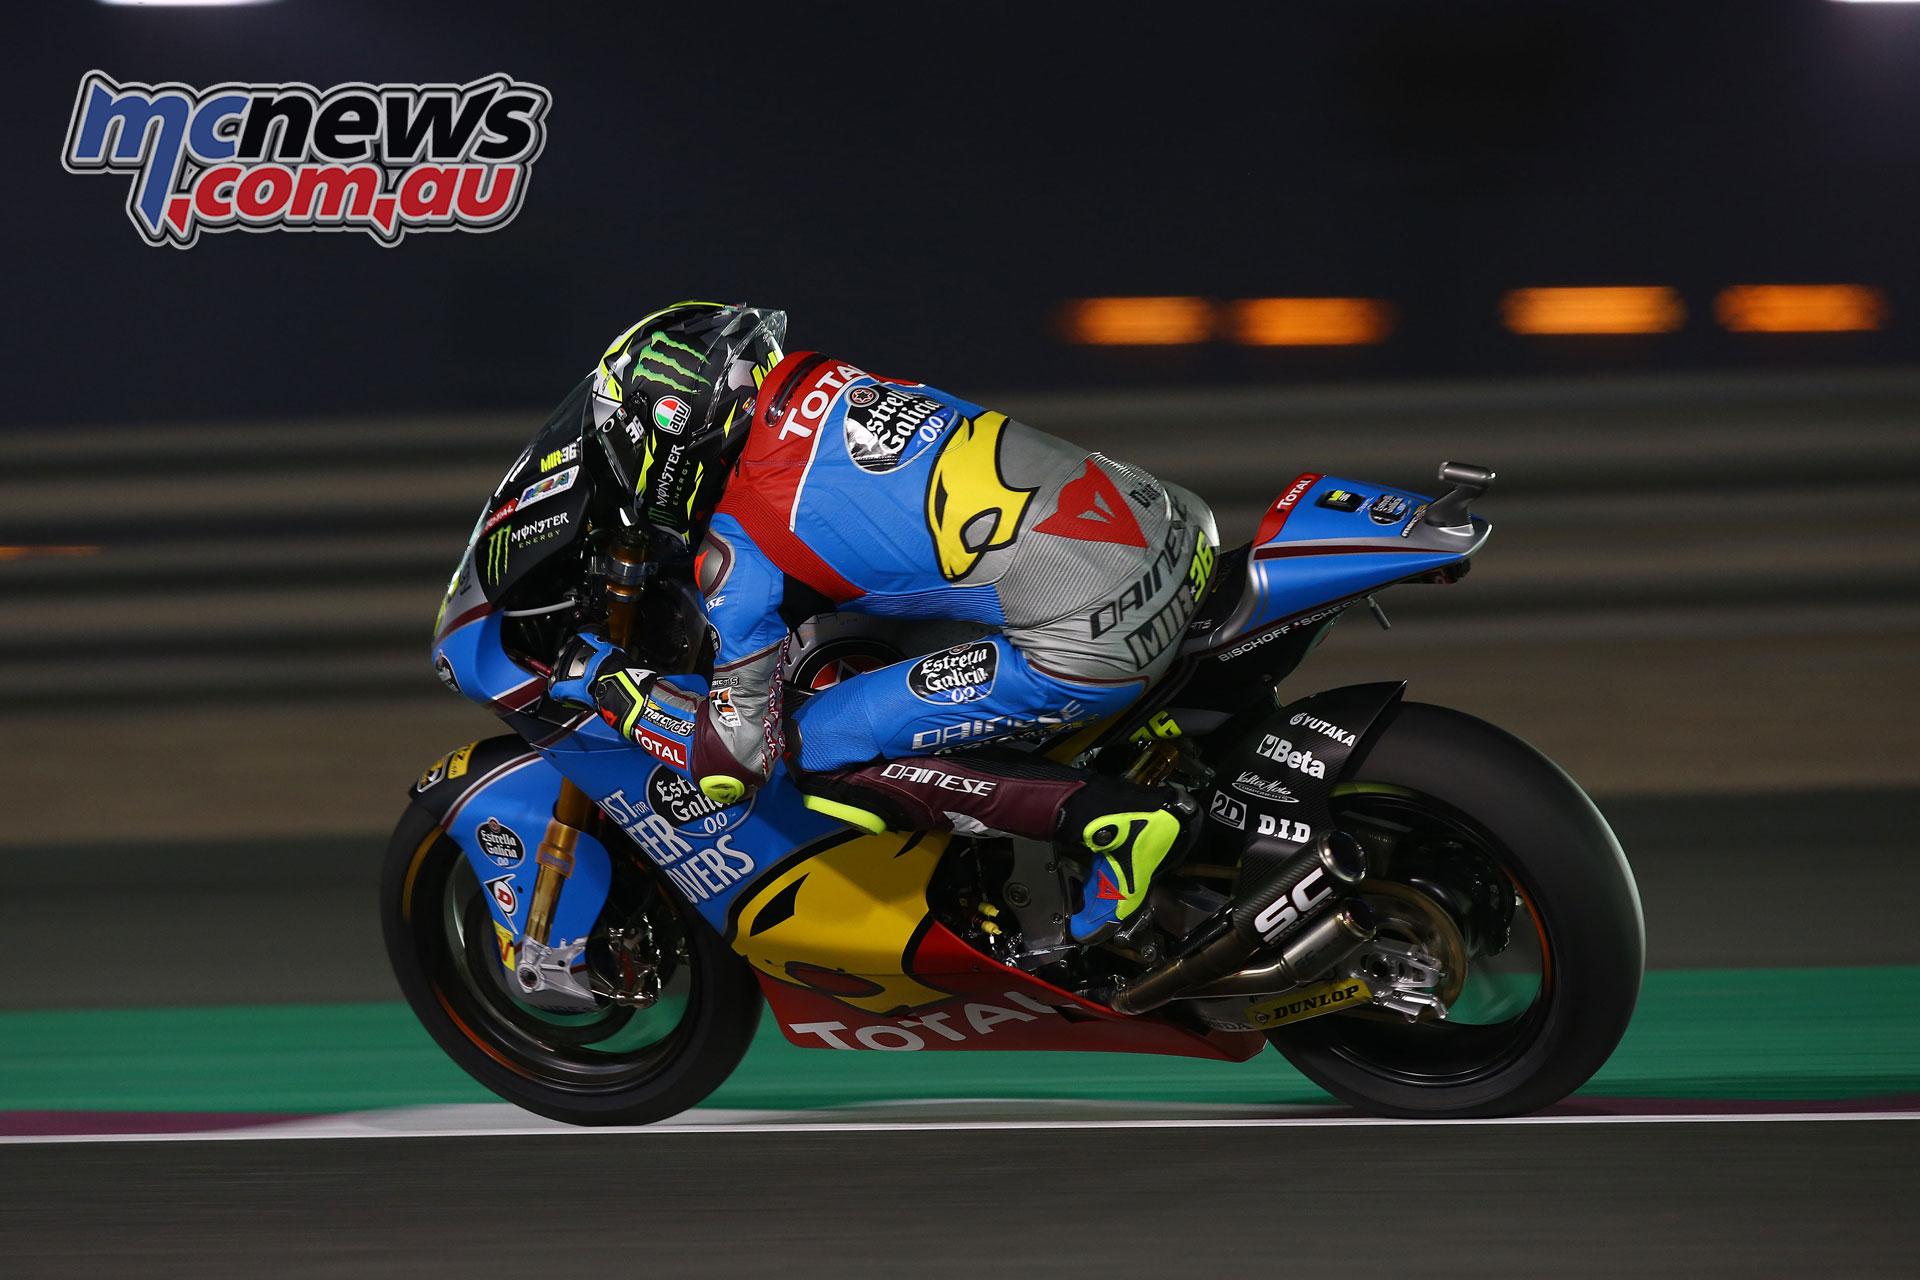 2018 Qatar MotoGP Images   Gallery C   MCNews.com.au